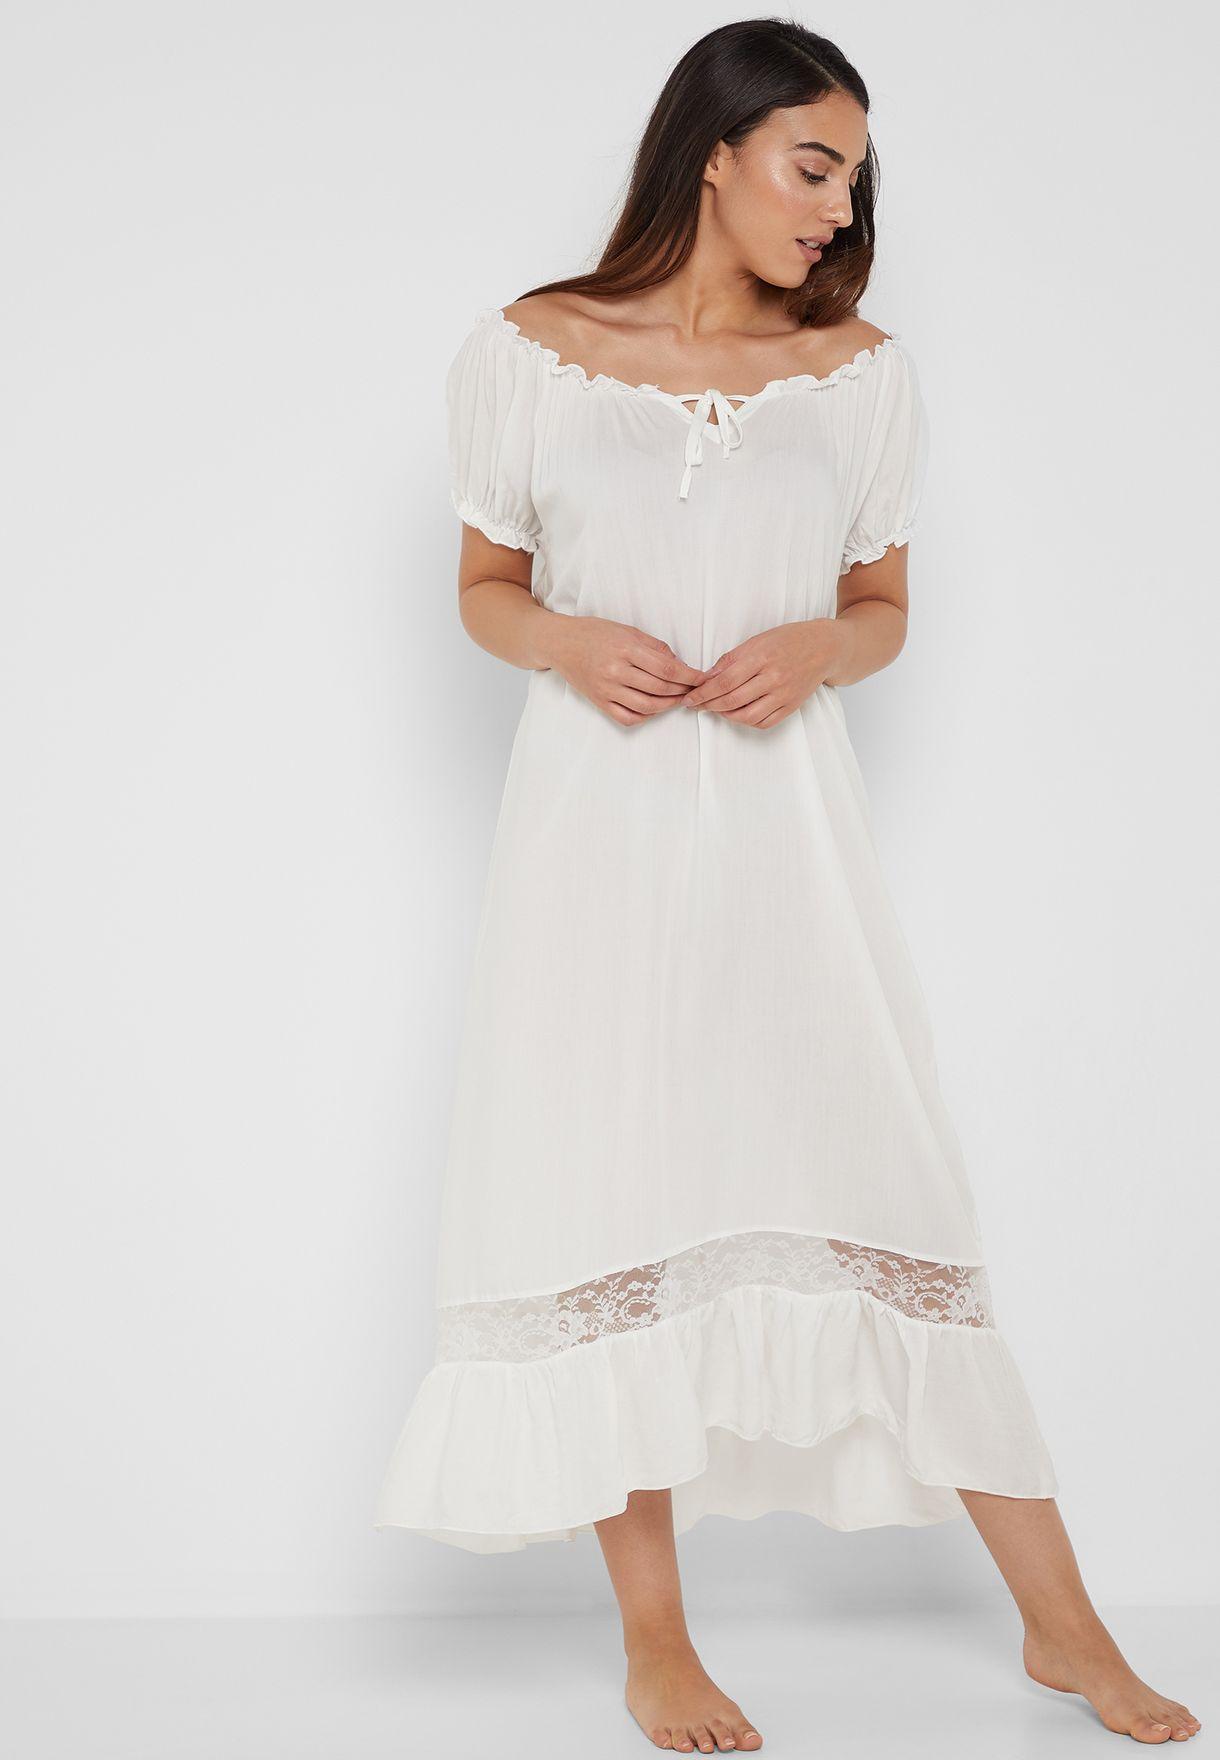 5013fffdfbc27 Shop Ella white Lace Insert Ruffle Hem Bardot Nightdress GT006 for ...